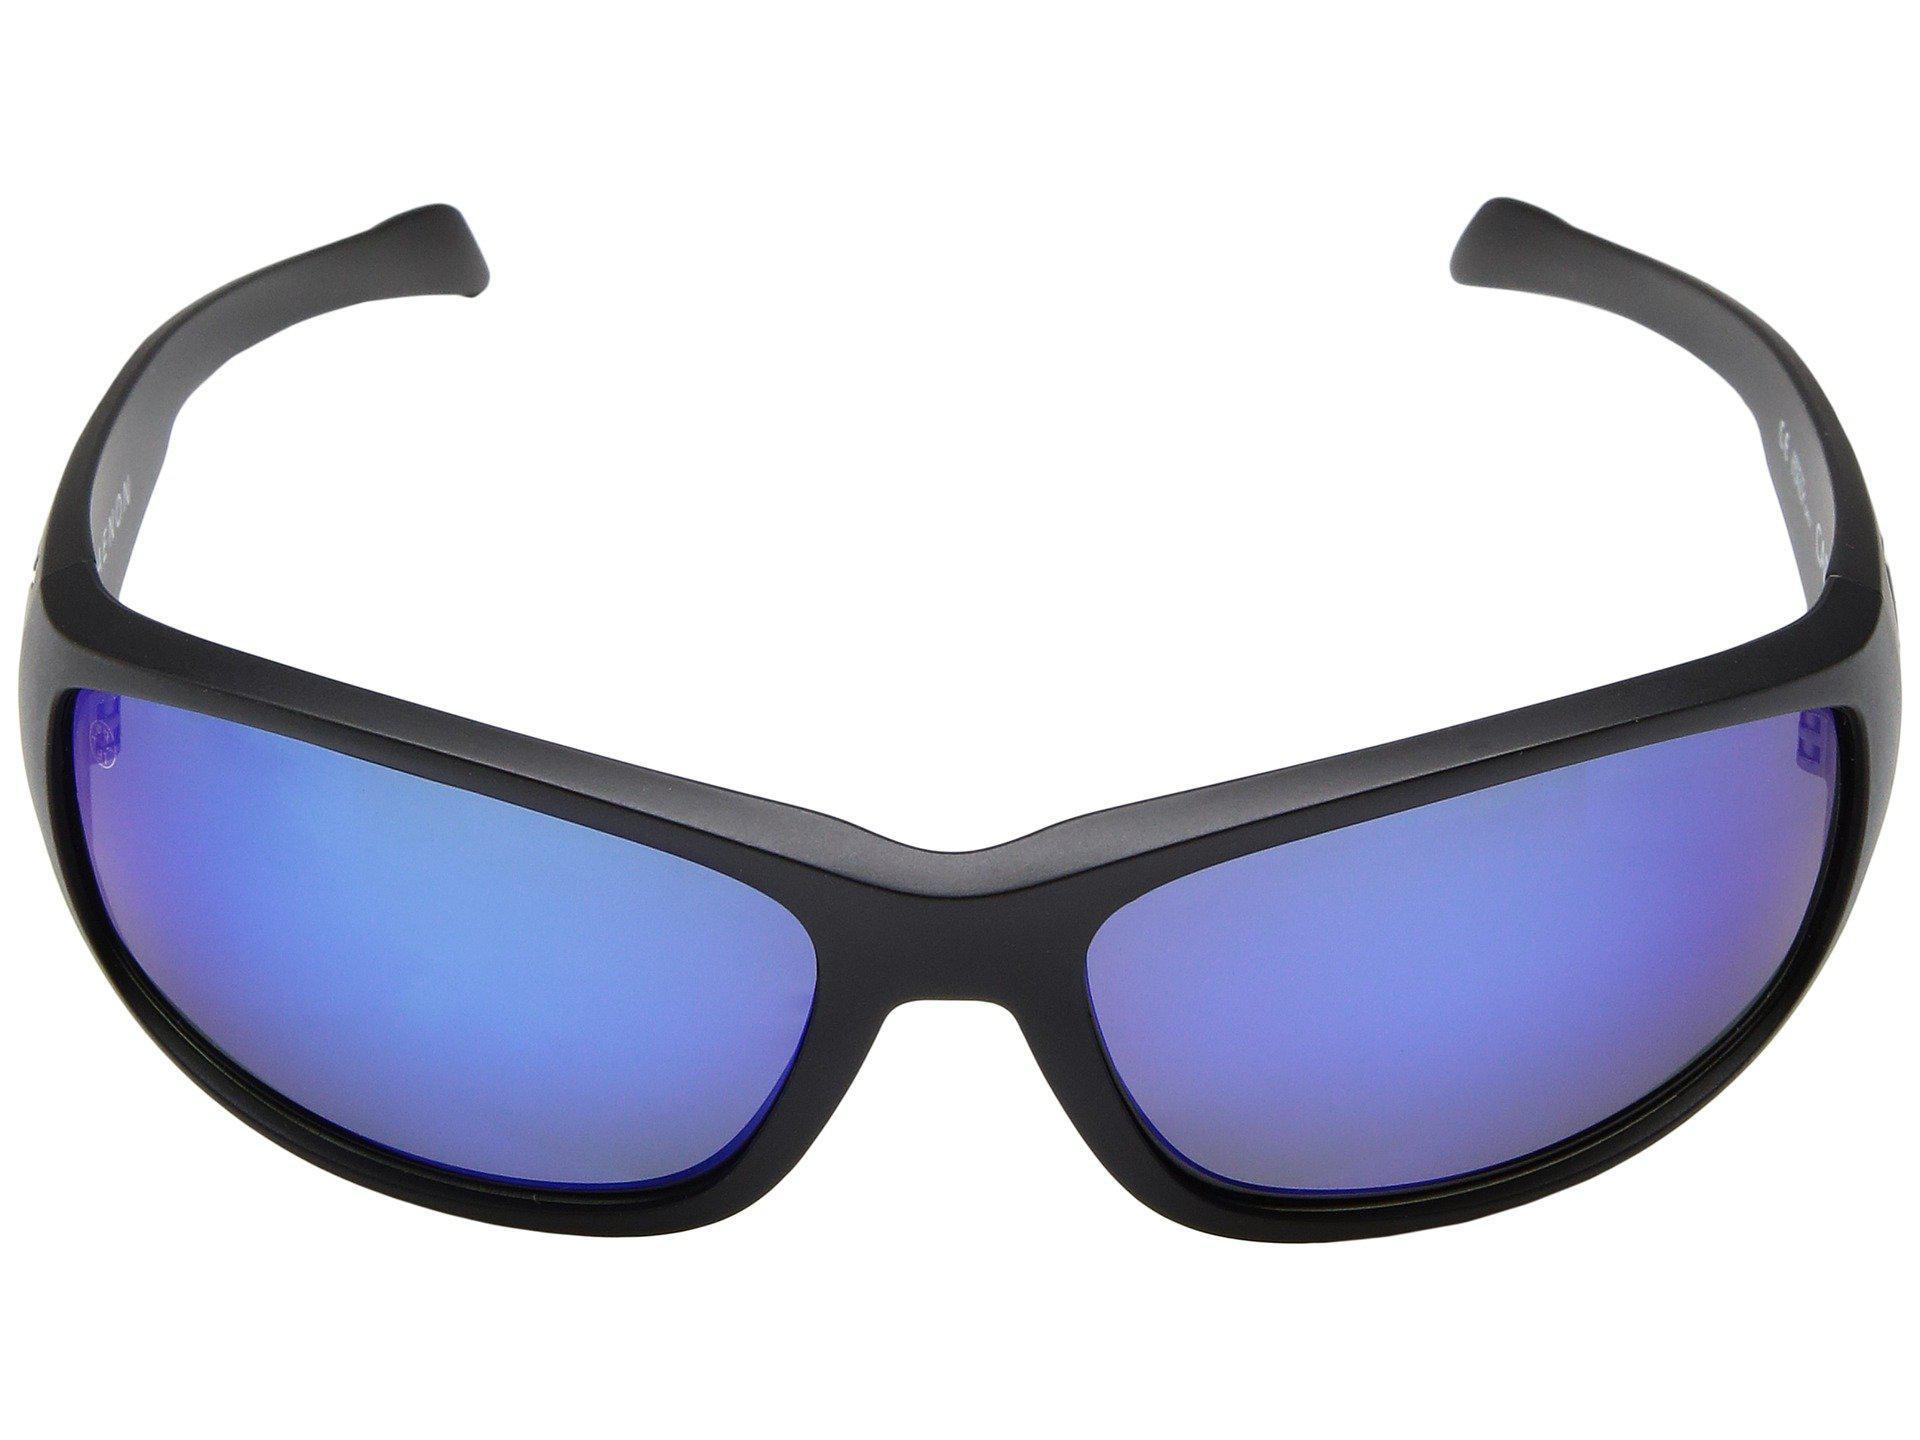 9c6142e28ee28 ... (black Matte Grip Ultra Grey 12-polarized) Sport Sunglasses. View  fullscreen